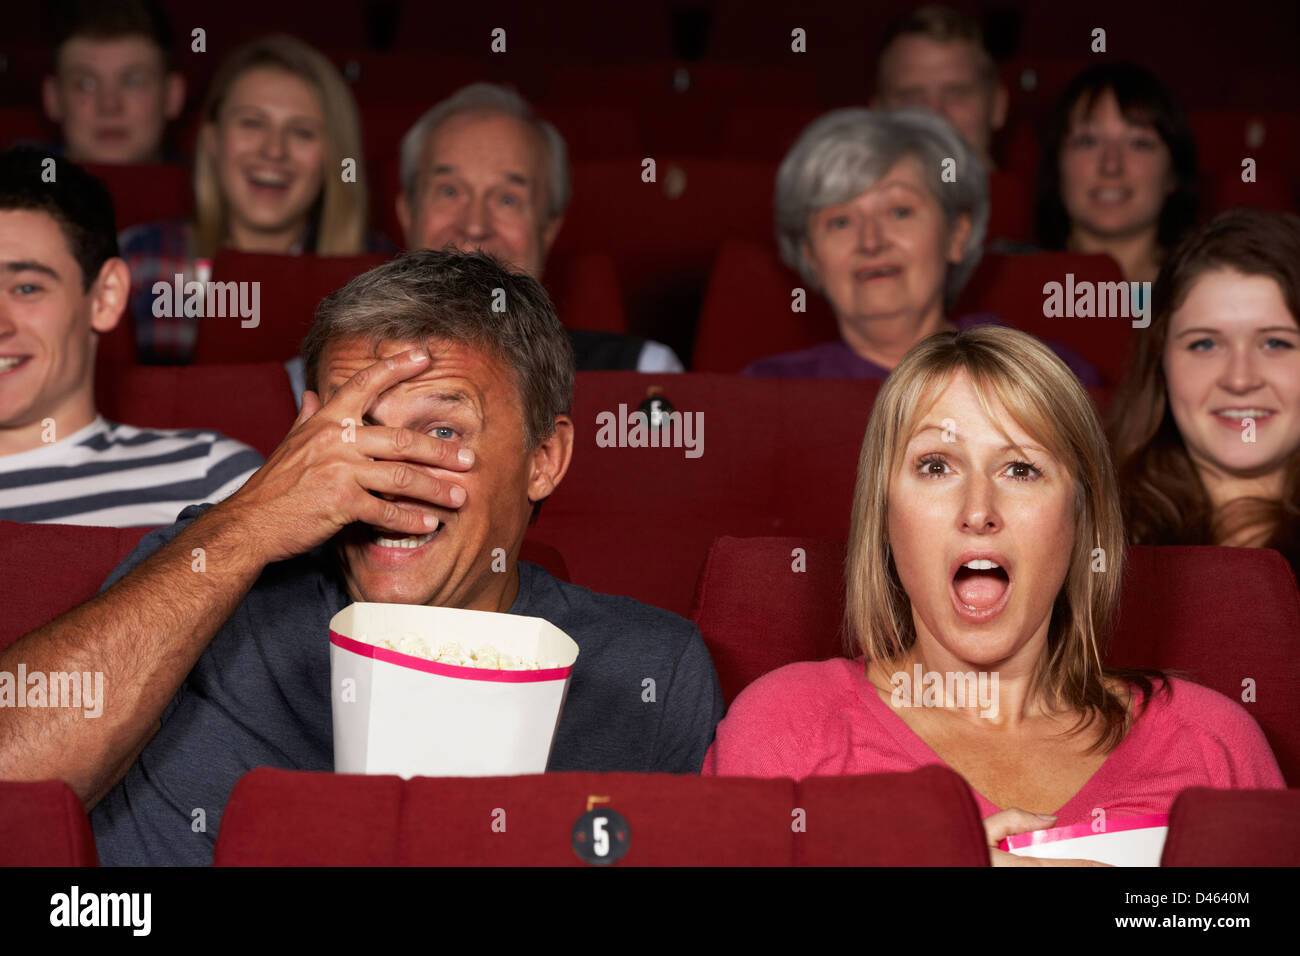 Couple Watching Film In Cinema Stock Photo